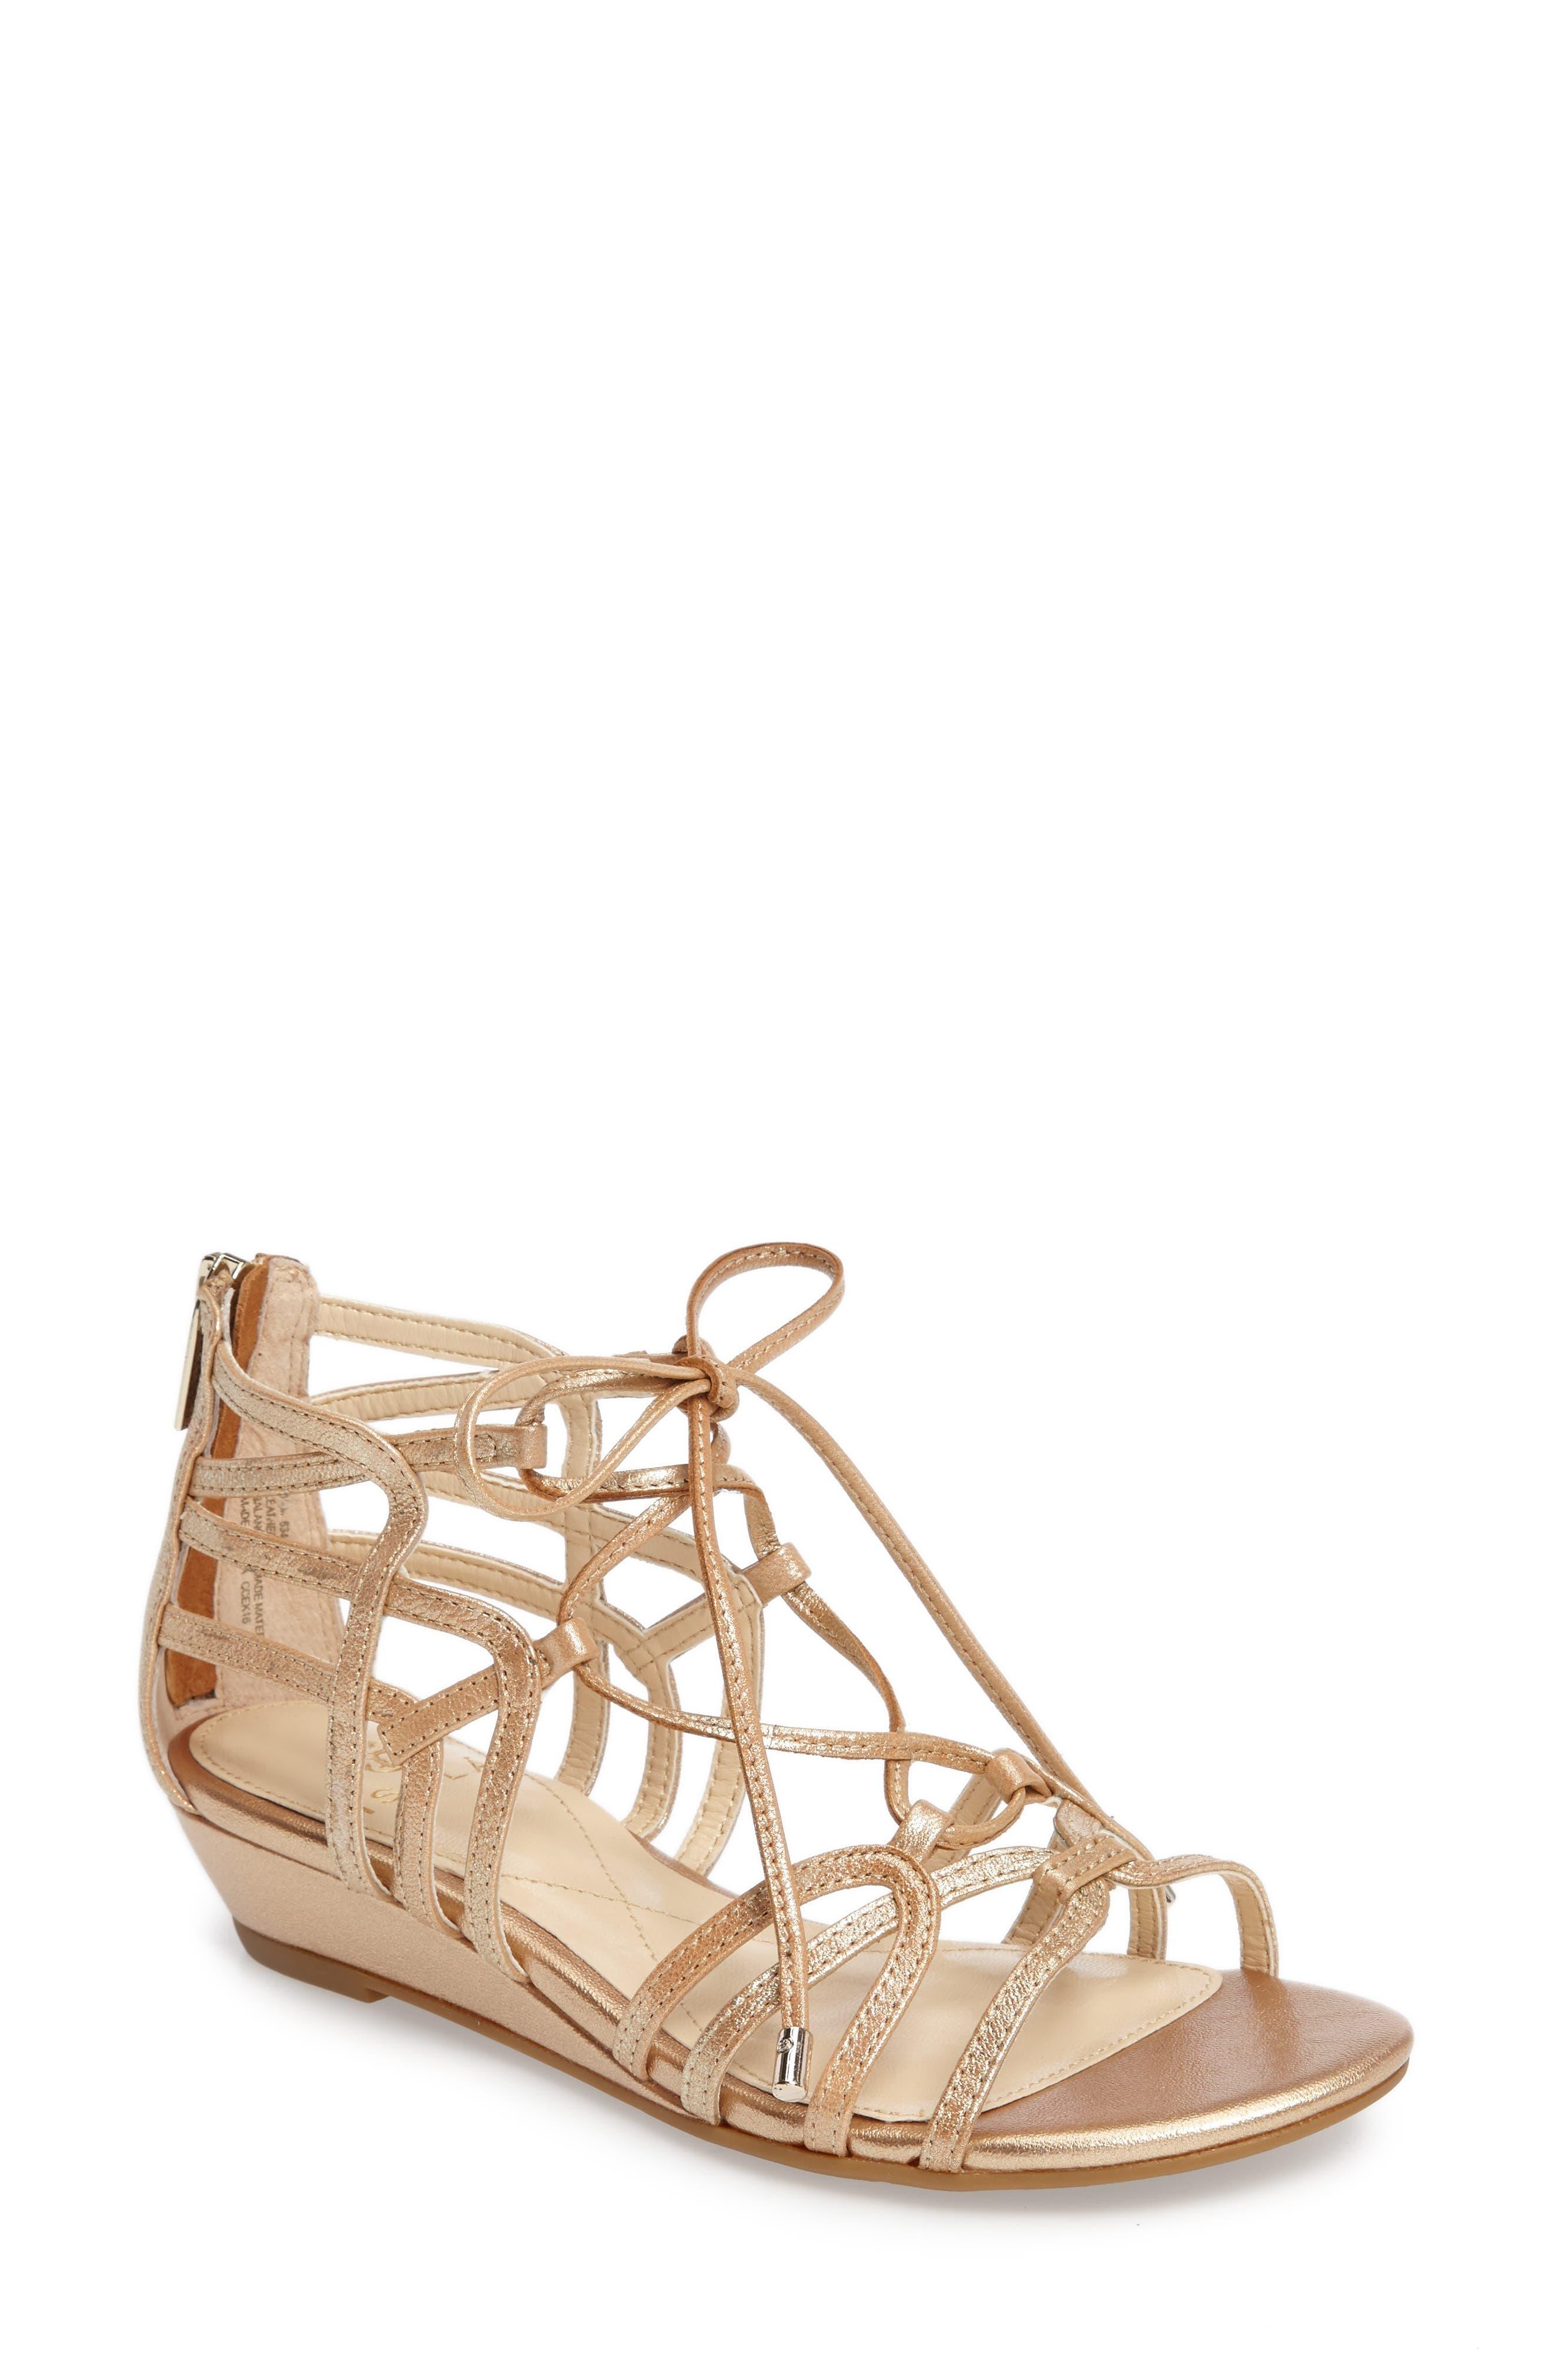 Elisia Lace-Up Sandal,                         Main,                         color, Gold Leather